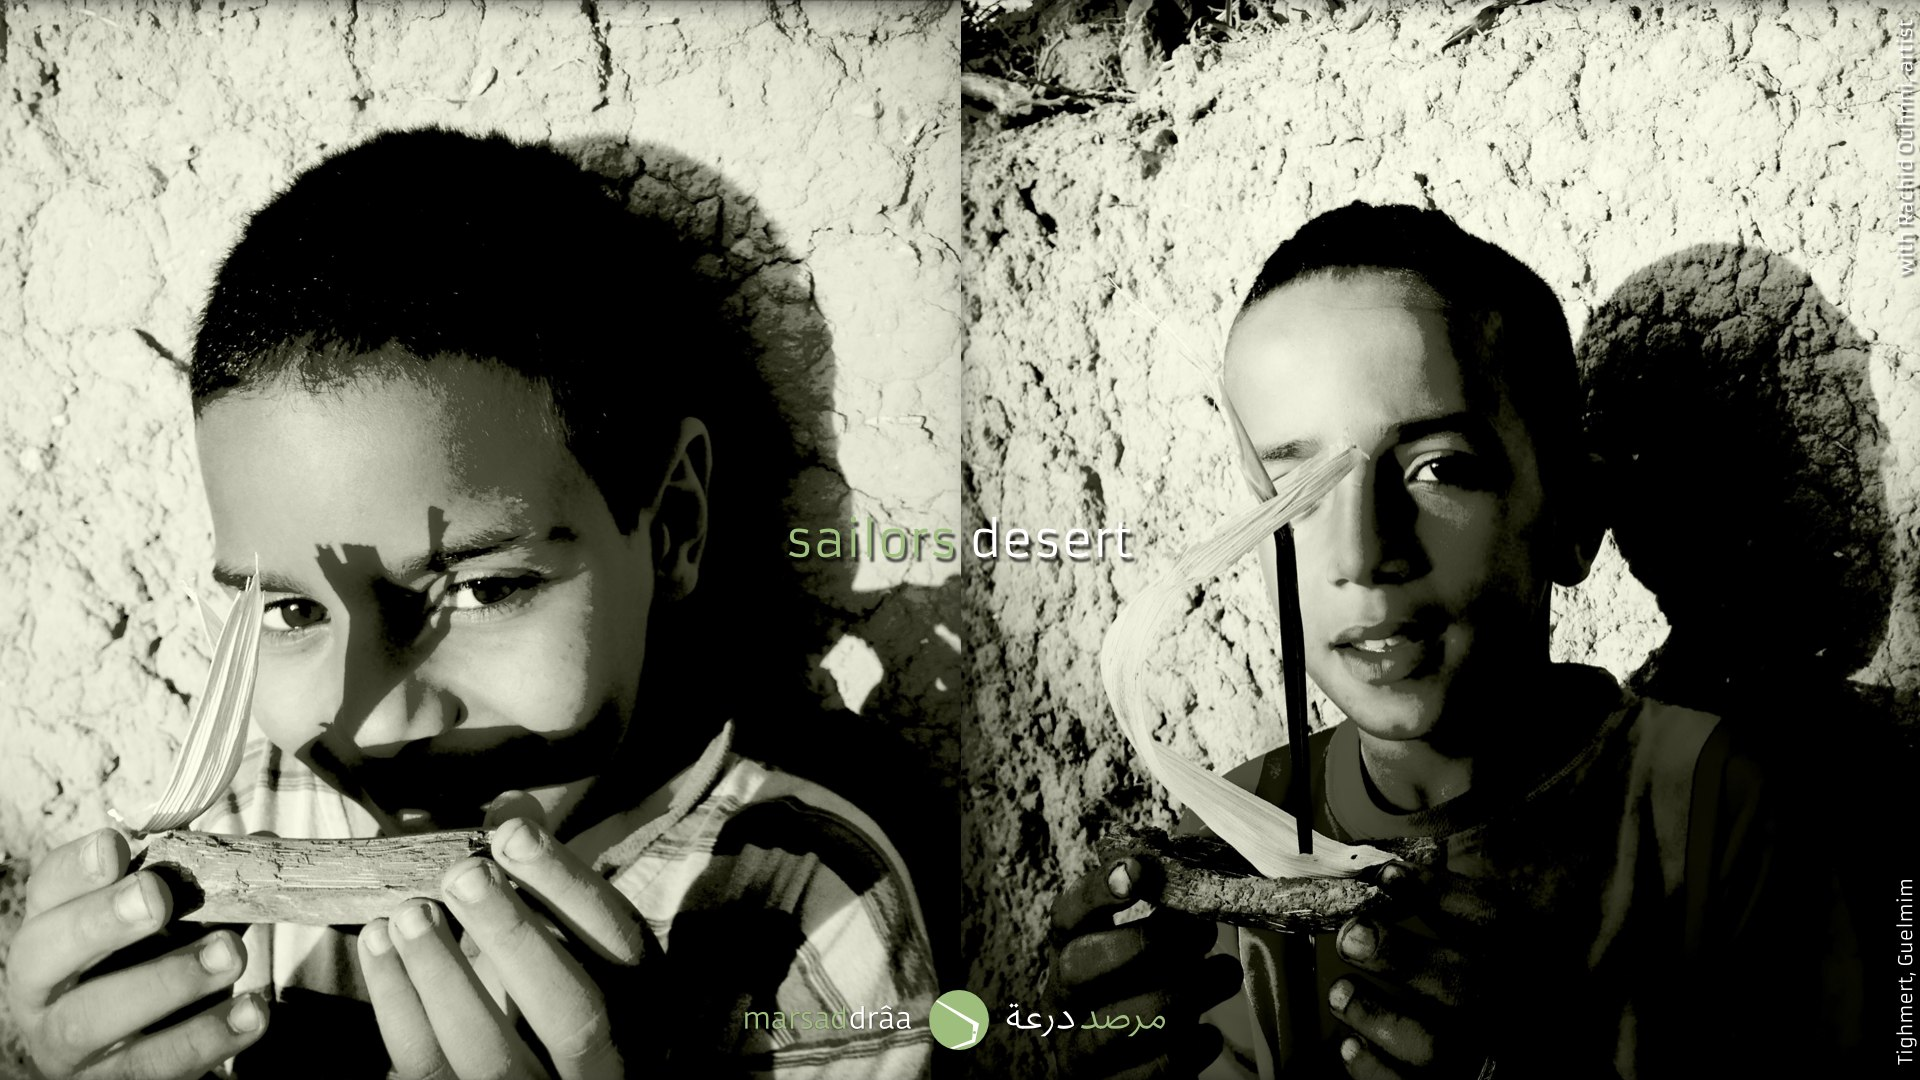 Some of the sailors of the desert, Ali and Abderrahim.